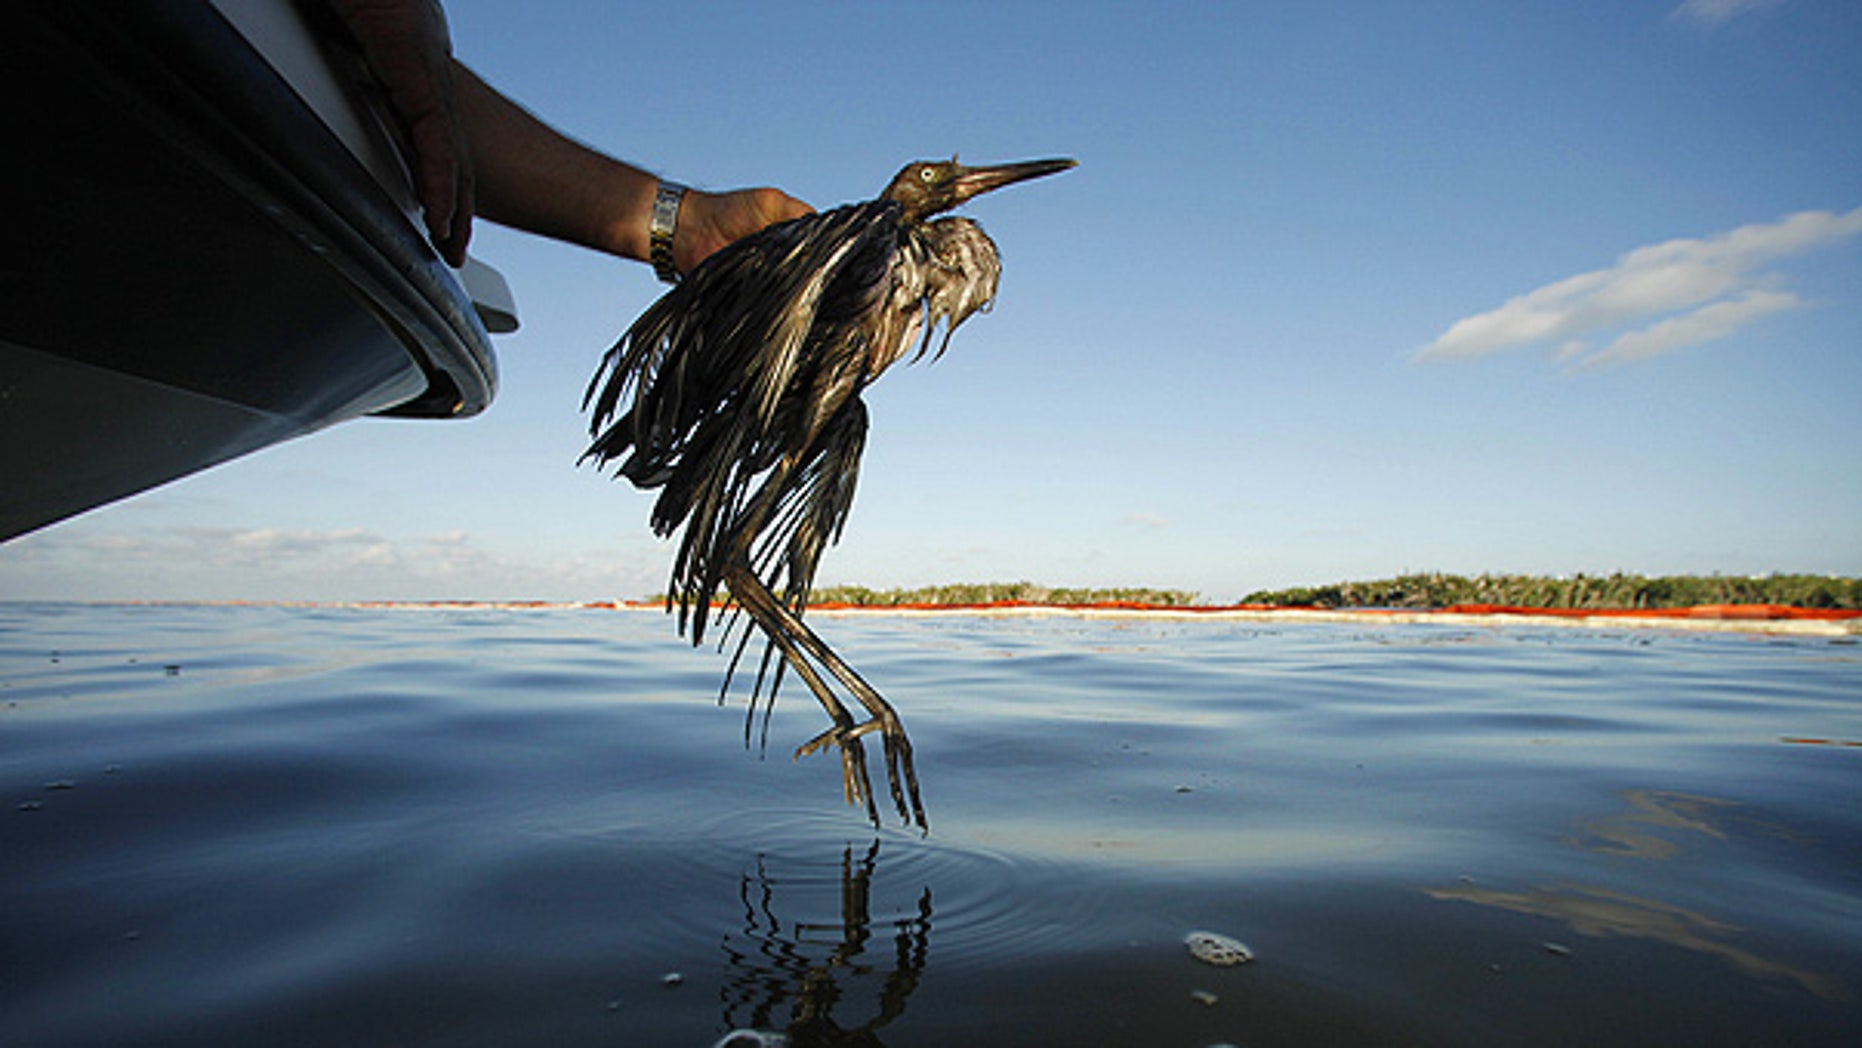 June 26: Plaquemines Parish Coastal Zone Director P.J. Hahn rescues a heavily oiled bird from Barataria Bay, La.